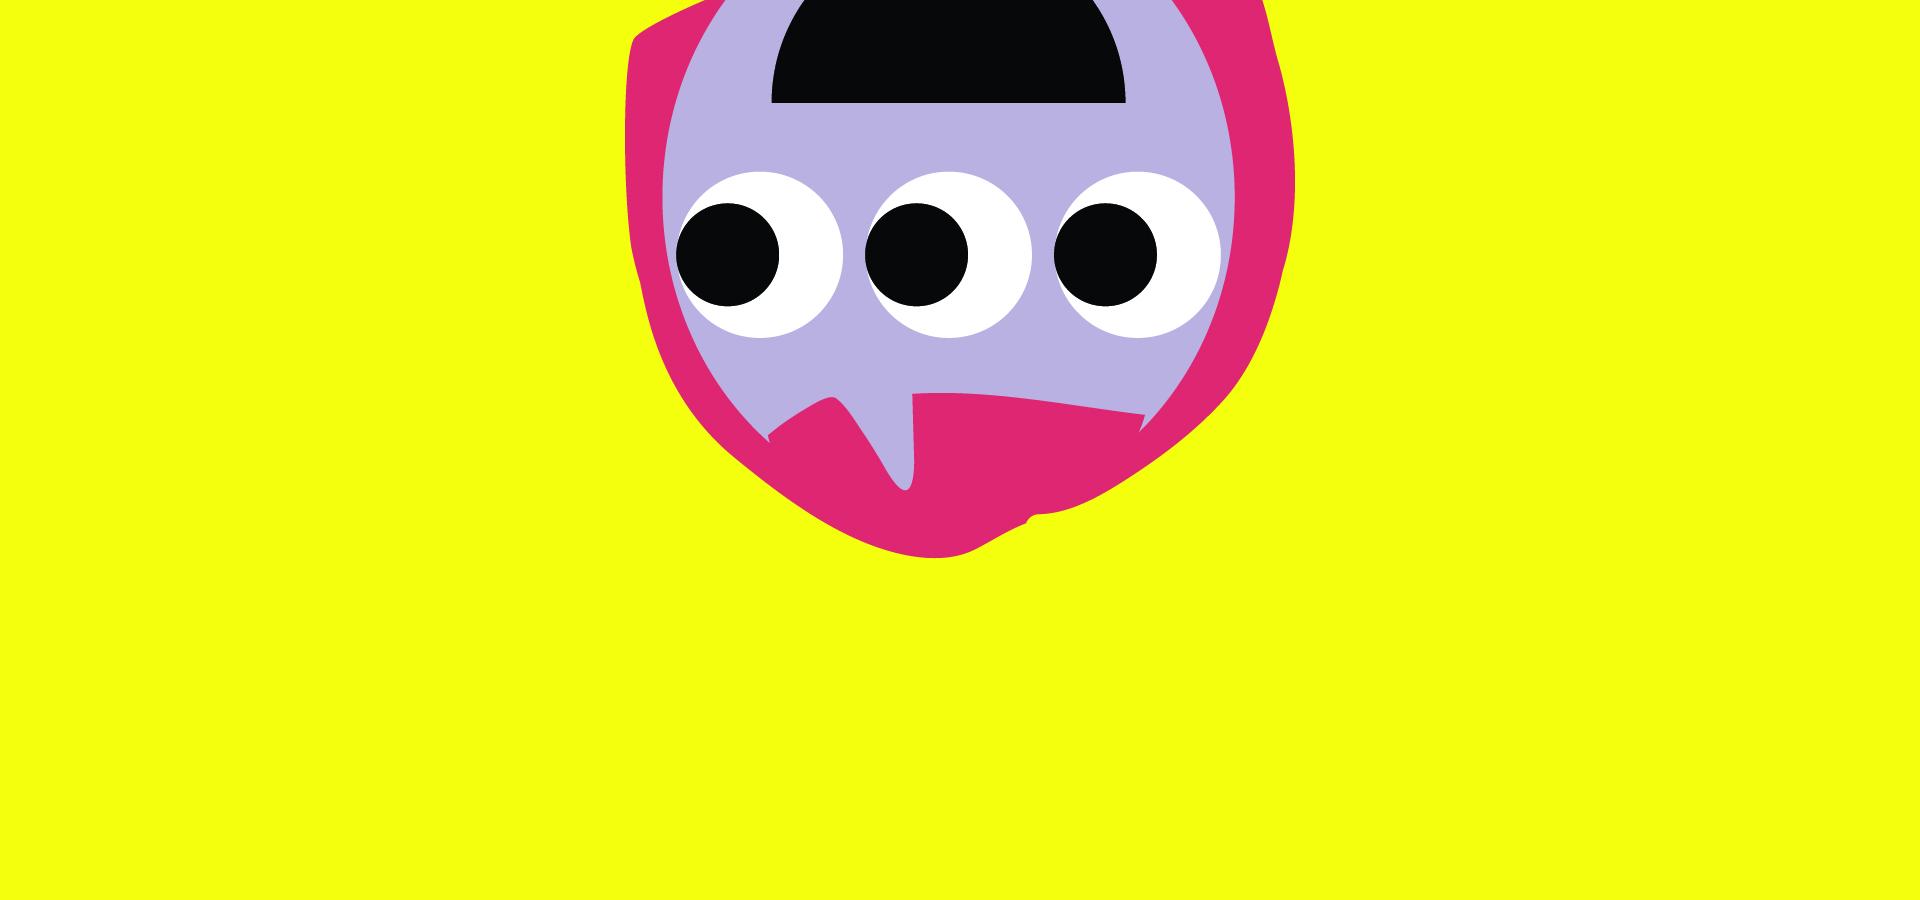 Pompom-homepage-banner-1.jpg